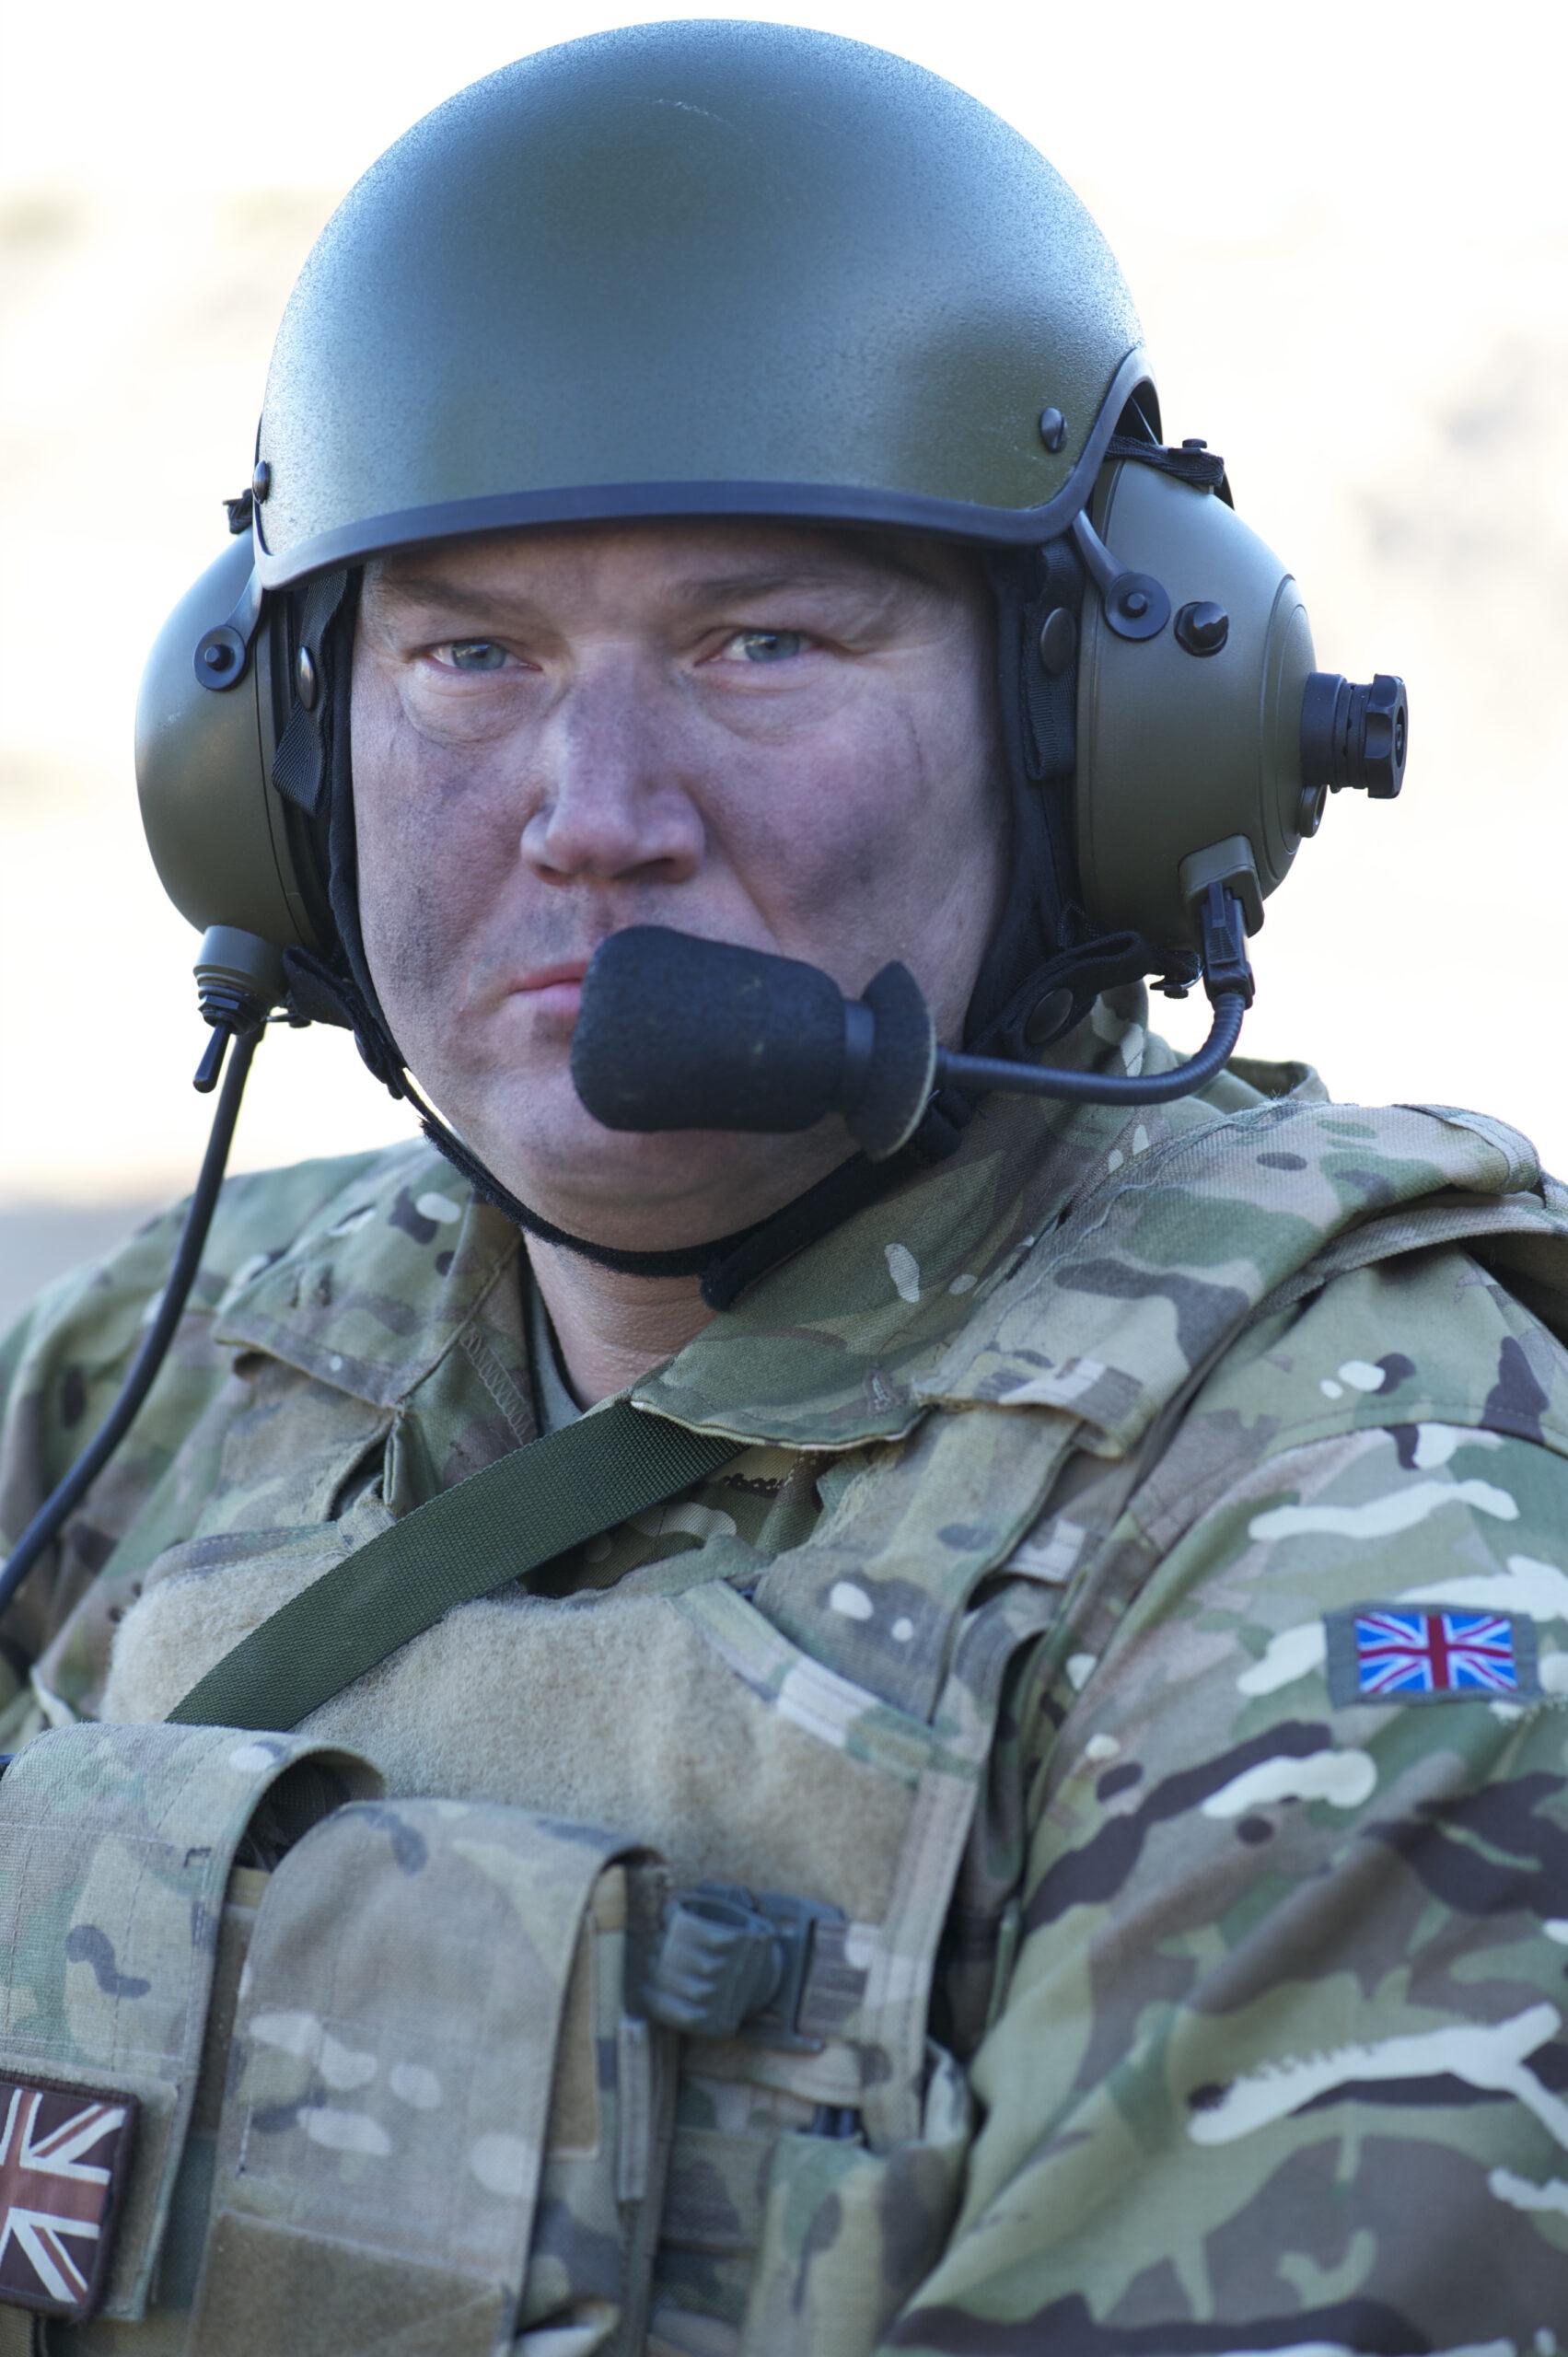 RA315 IHS – UK army